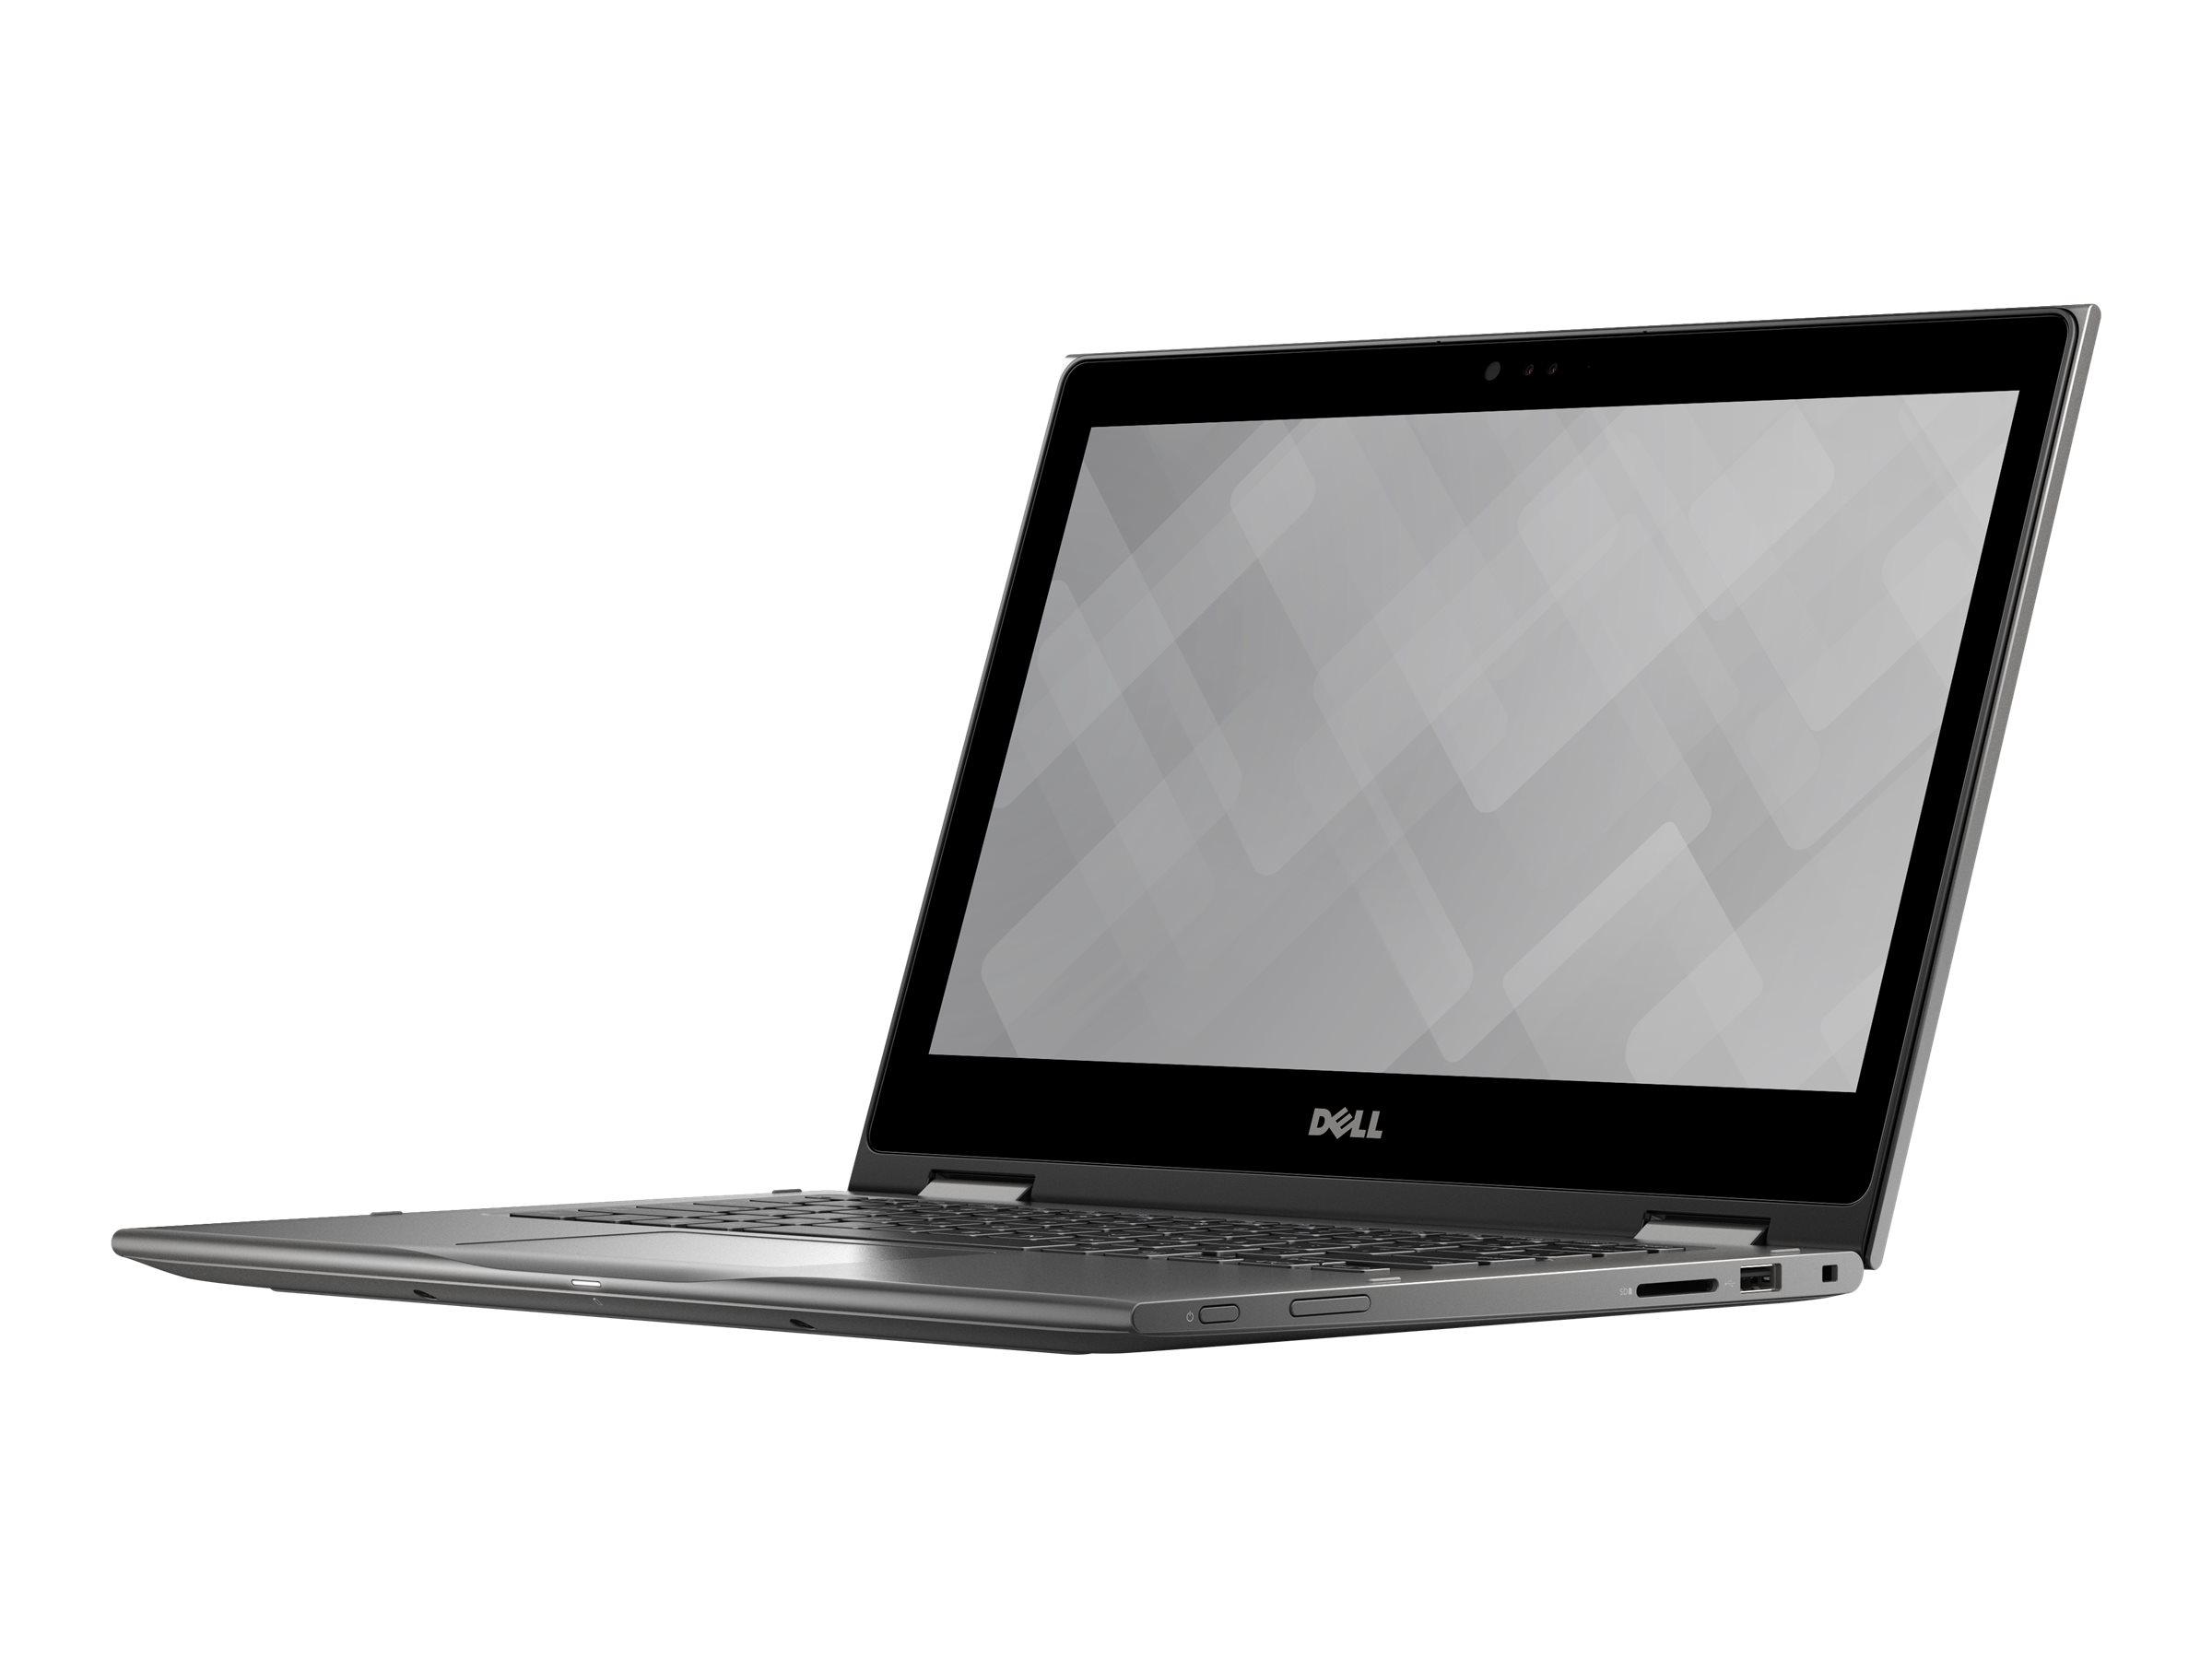 "Dell Inspiron 5378 - 13,3"" Notebook - Pentium 4000 2,3 GHz 33,8 cm"